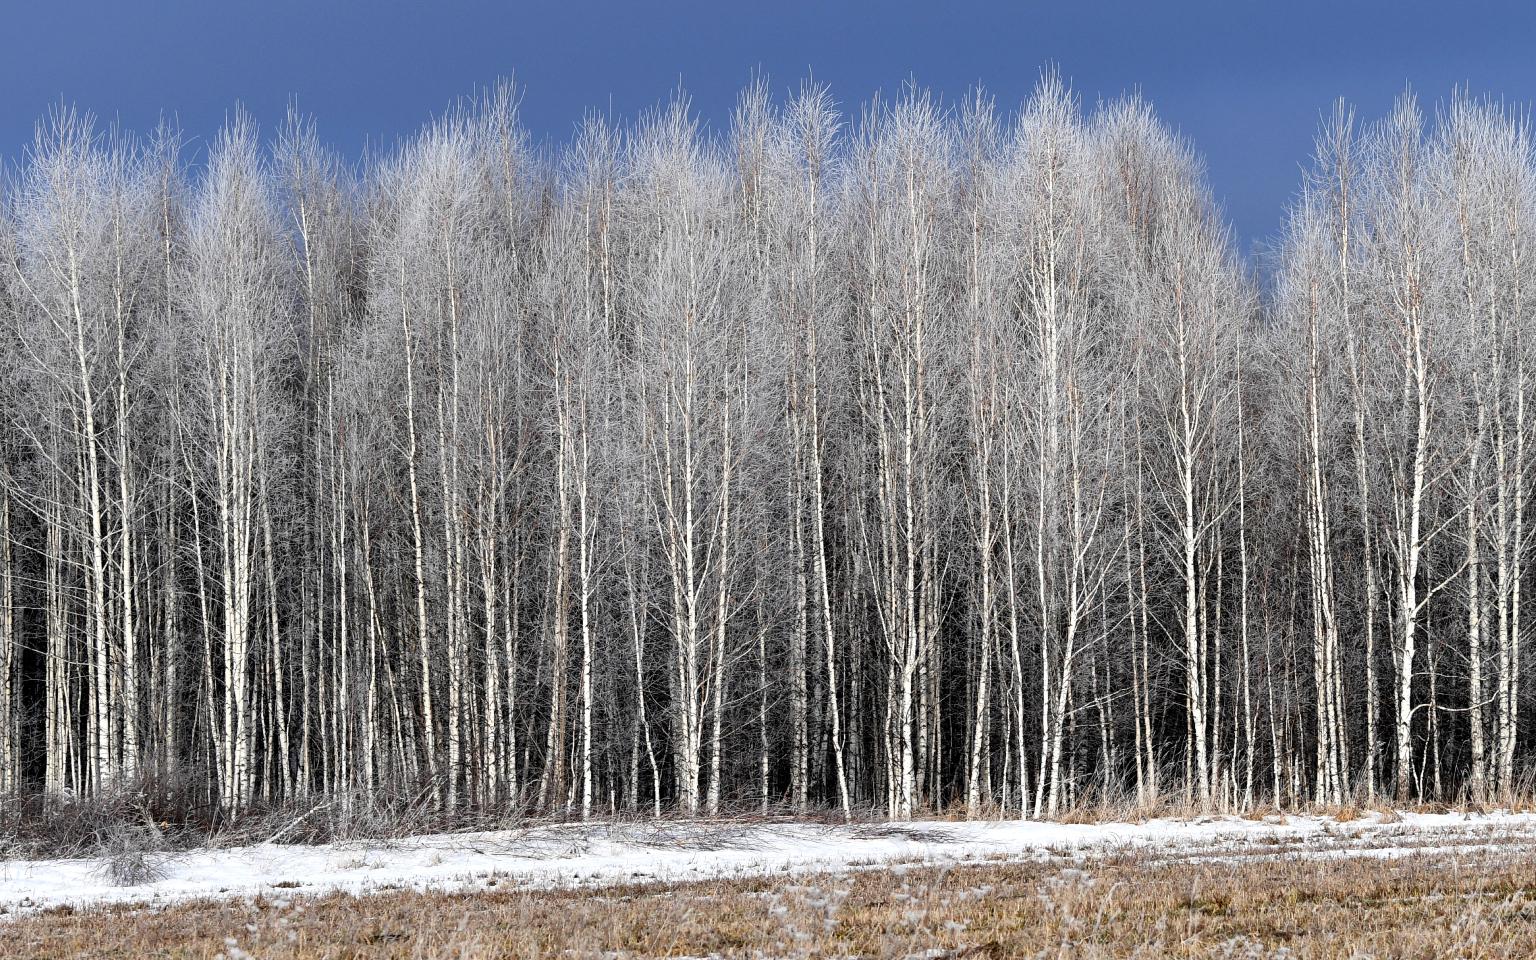 Фото: Илья Наймушин / РИА Новости